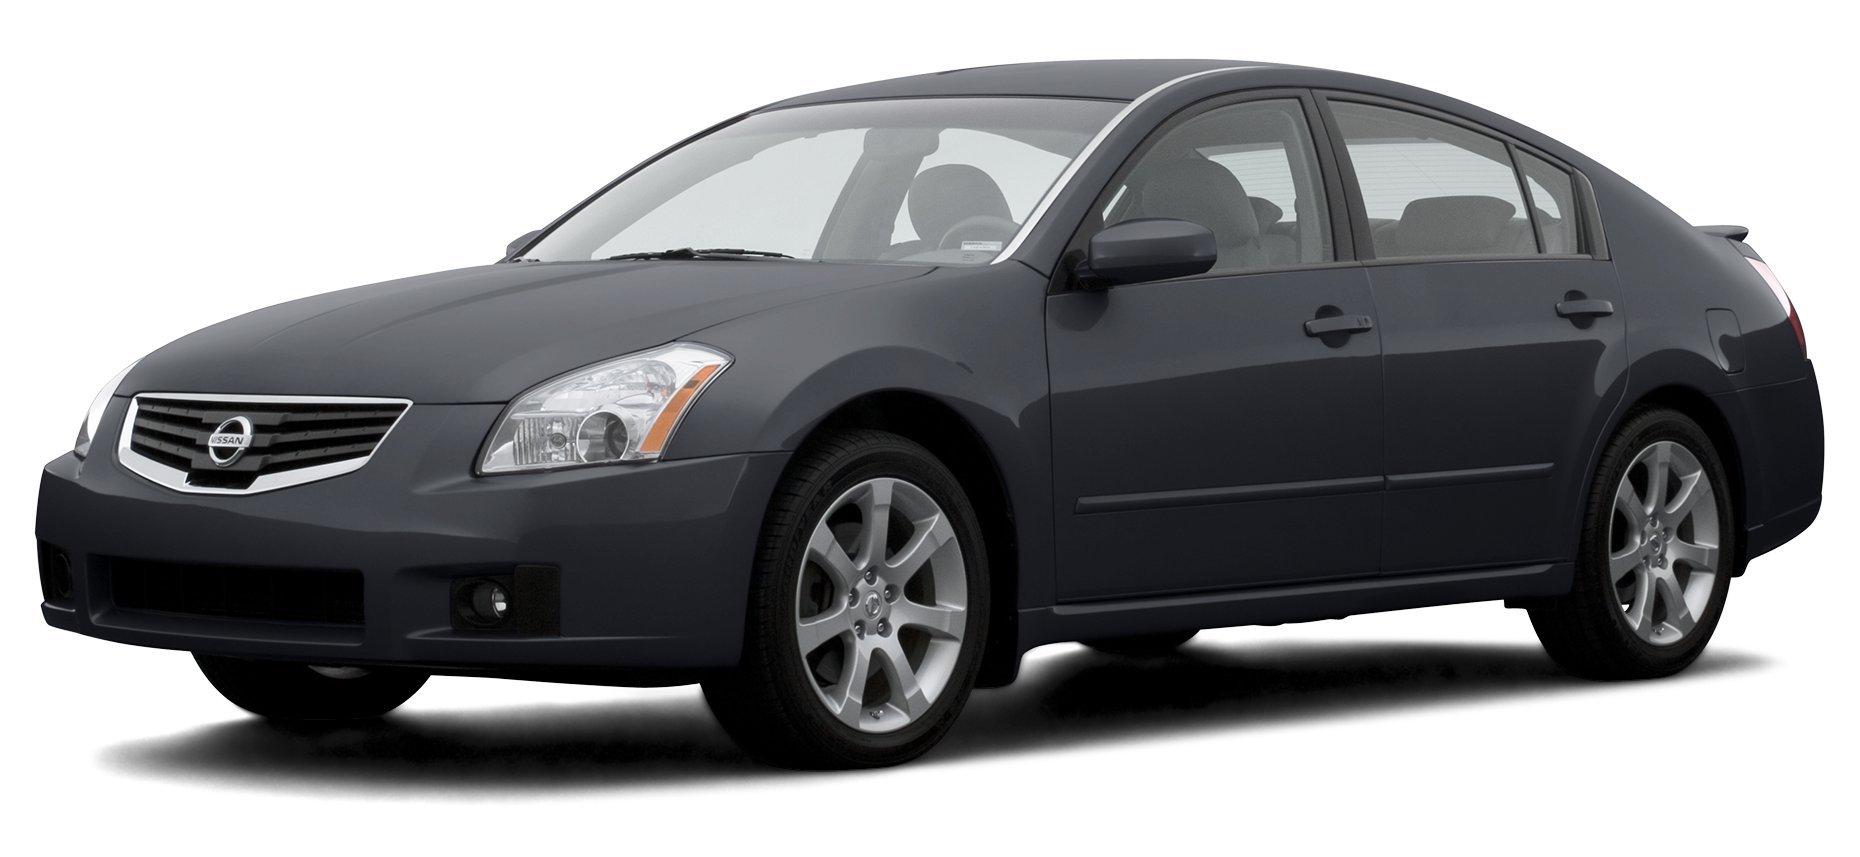 07 Nissan Maxima >> Amazon Com 2007 Nissan Maxima Reviews Images And Specs